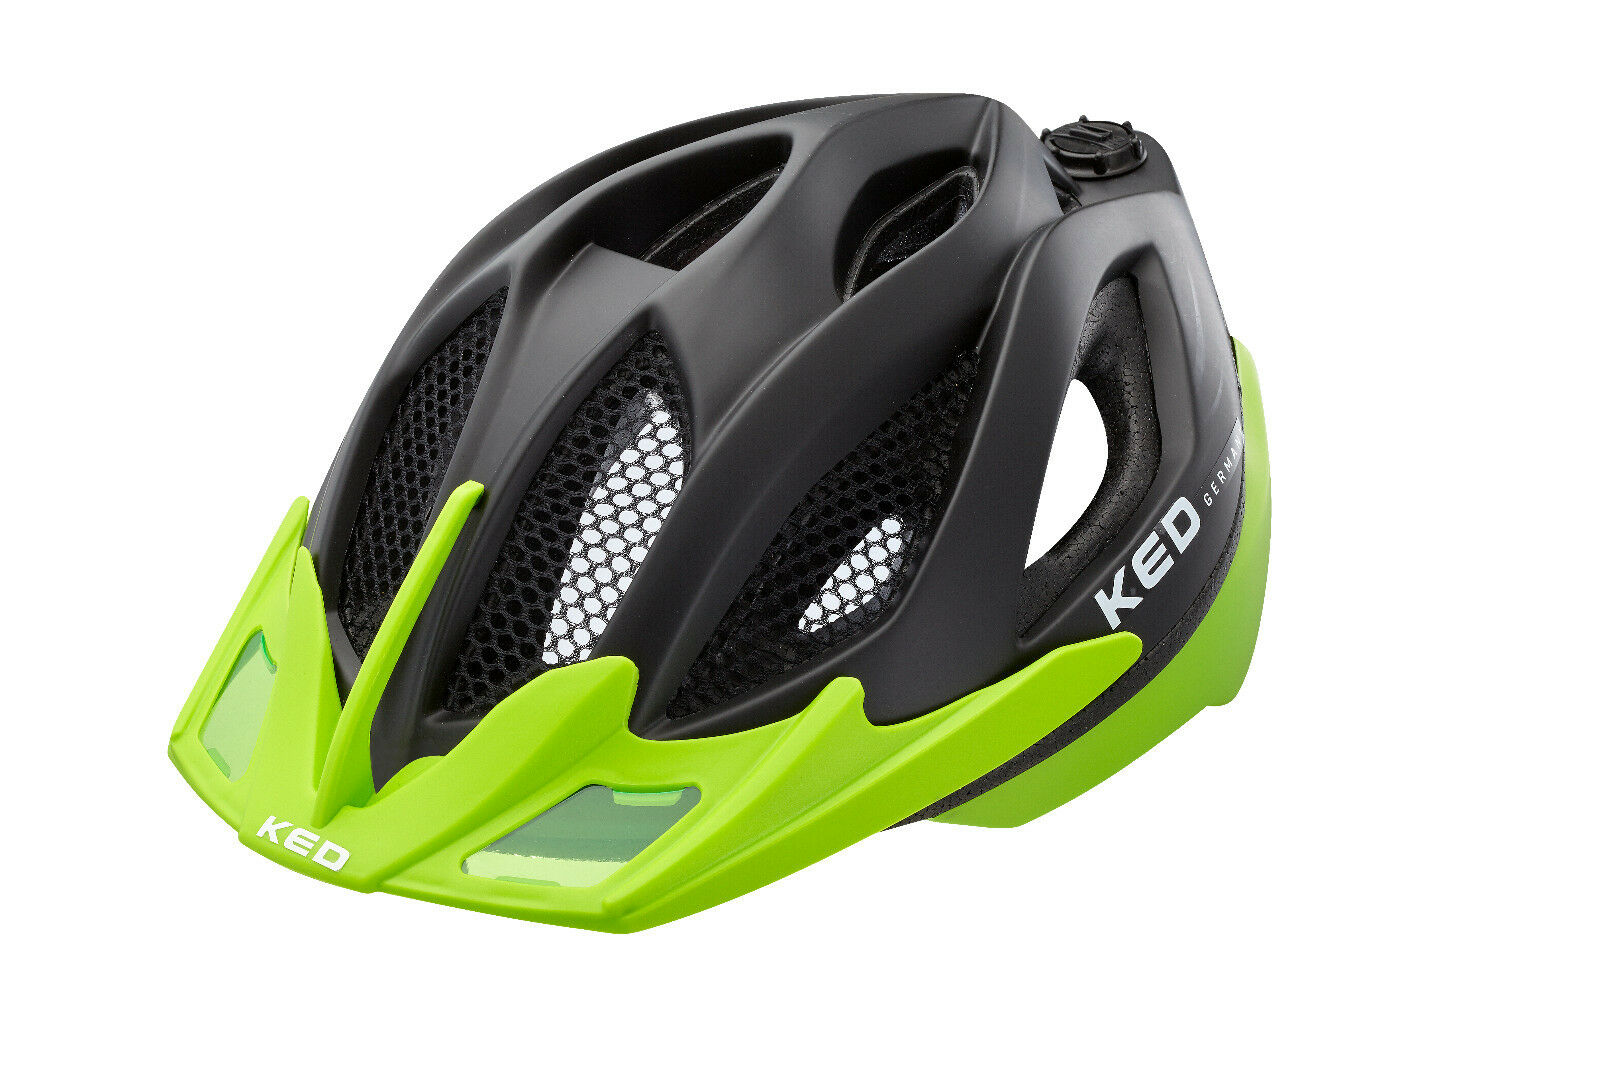 KED Casco bicicletta spiri two verde Nero opaco   taglia M 5258 cm   16302220